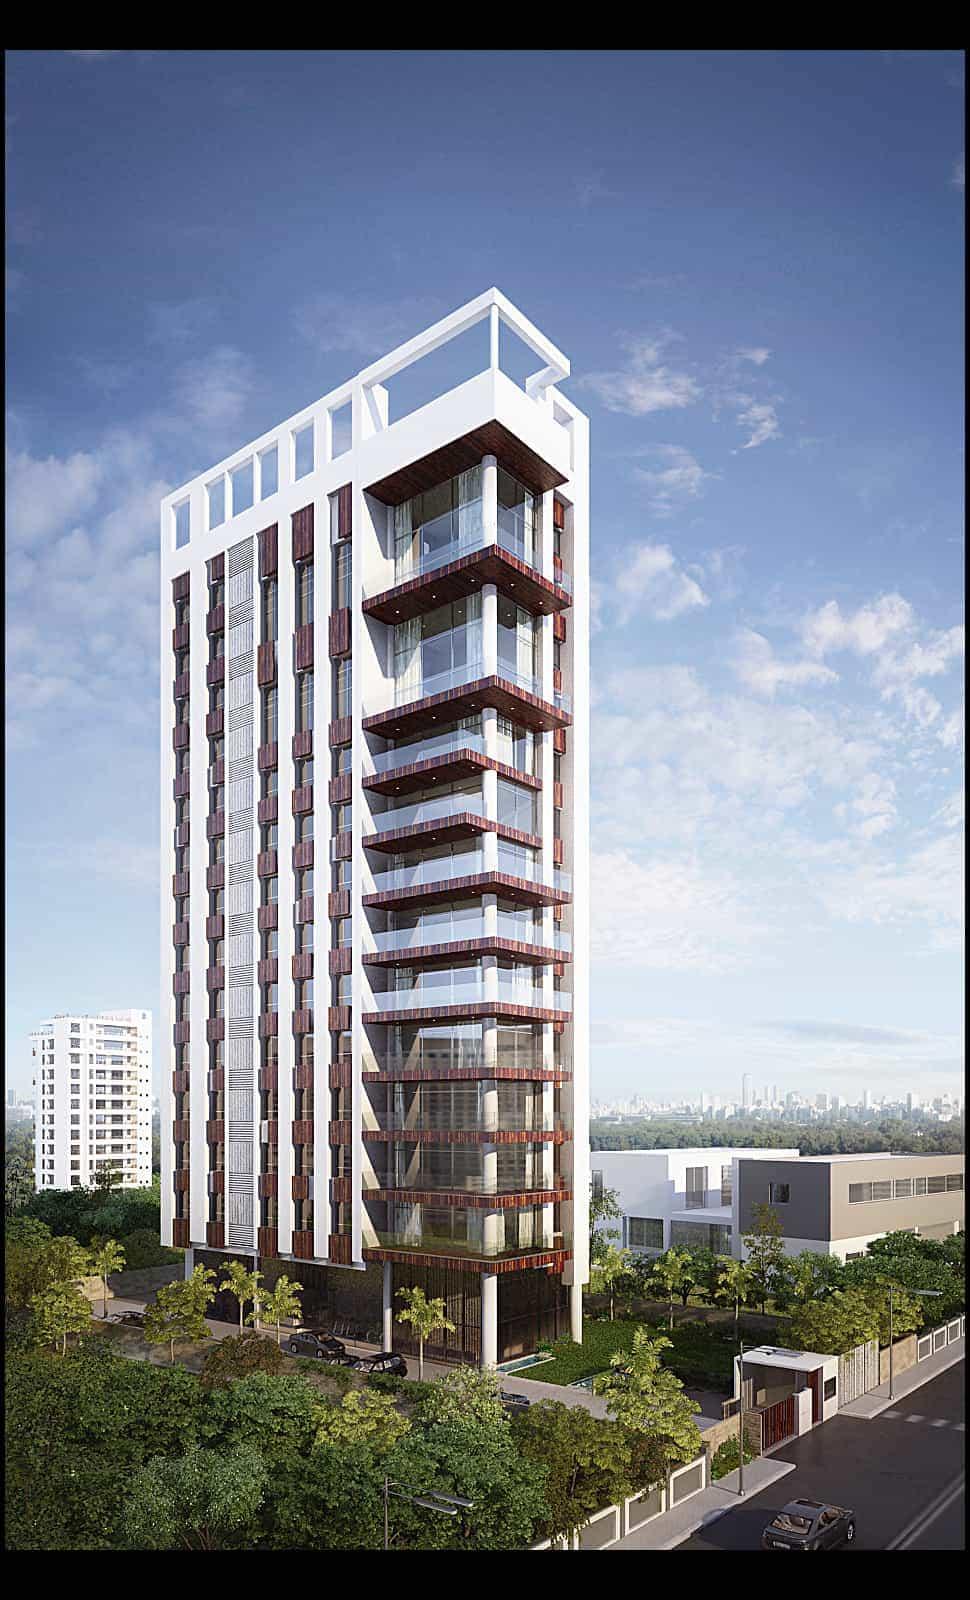 Apartments for Sale in Ballygunge, Kolkata | Unimark Grand